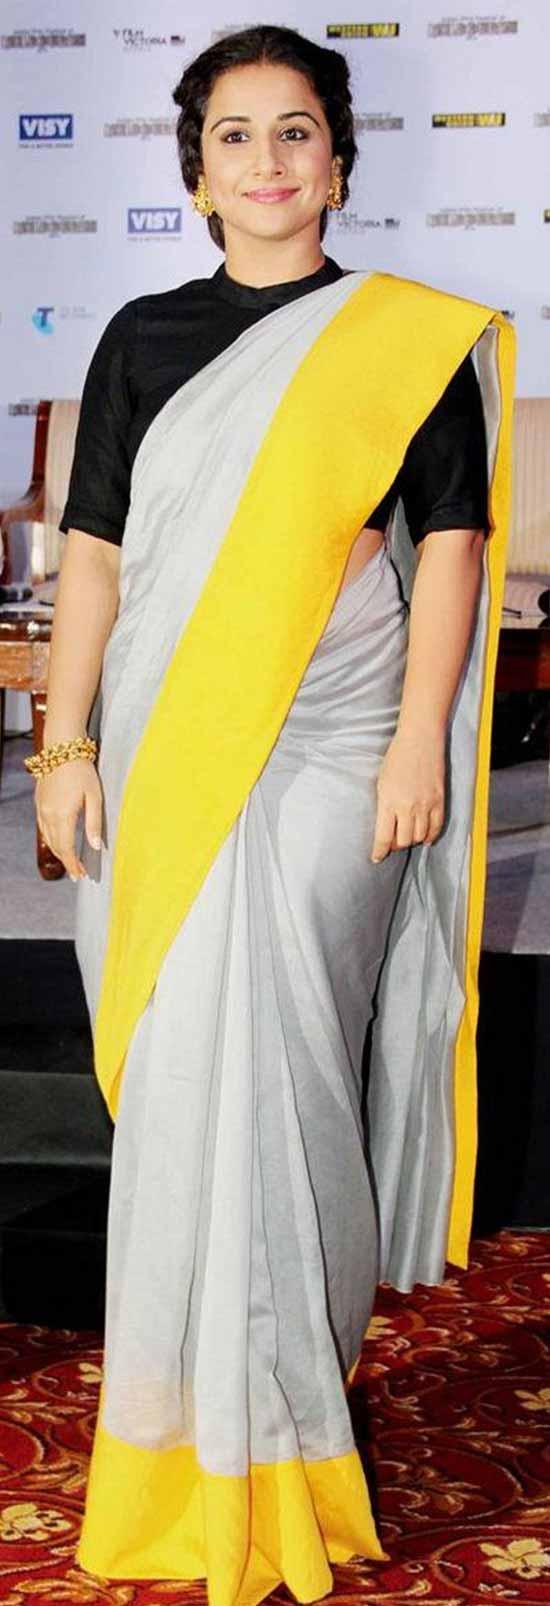 Vidya-Balan-Plane-Cream-Saree-And-Yellow-Boeder-With-Black-Blouse